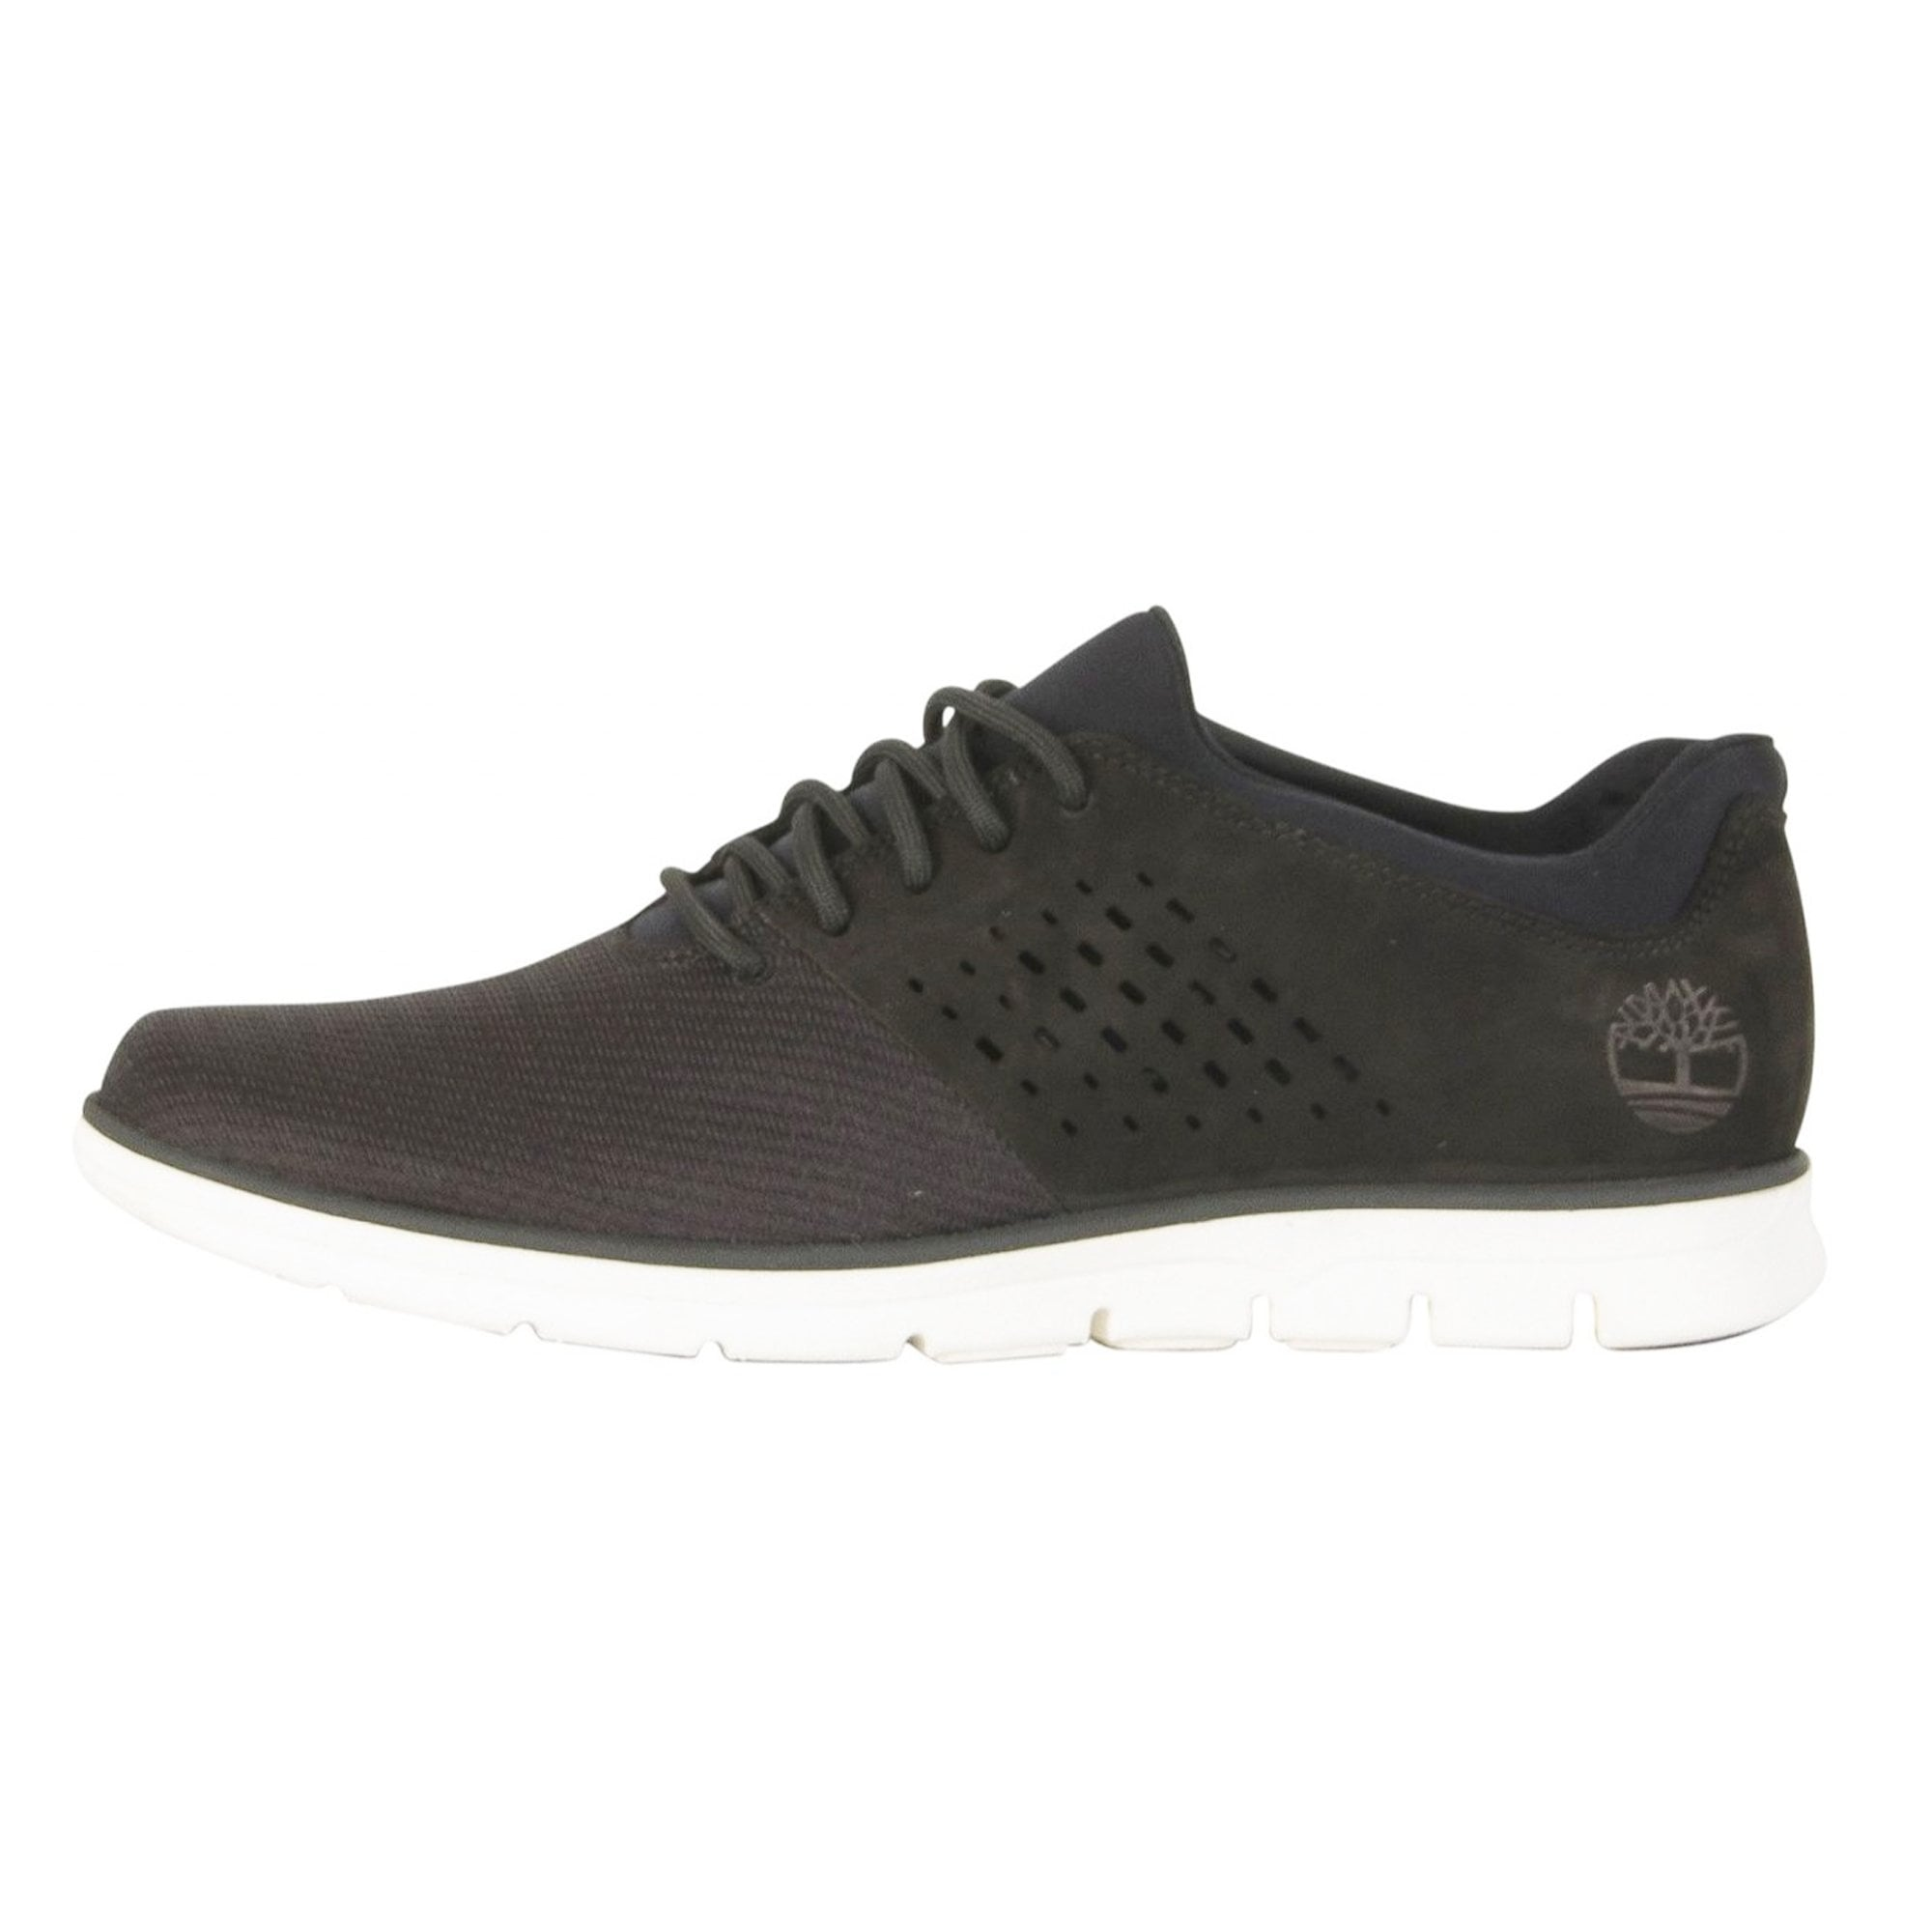 Buy Timberland Trainers | CBMenswear